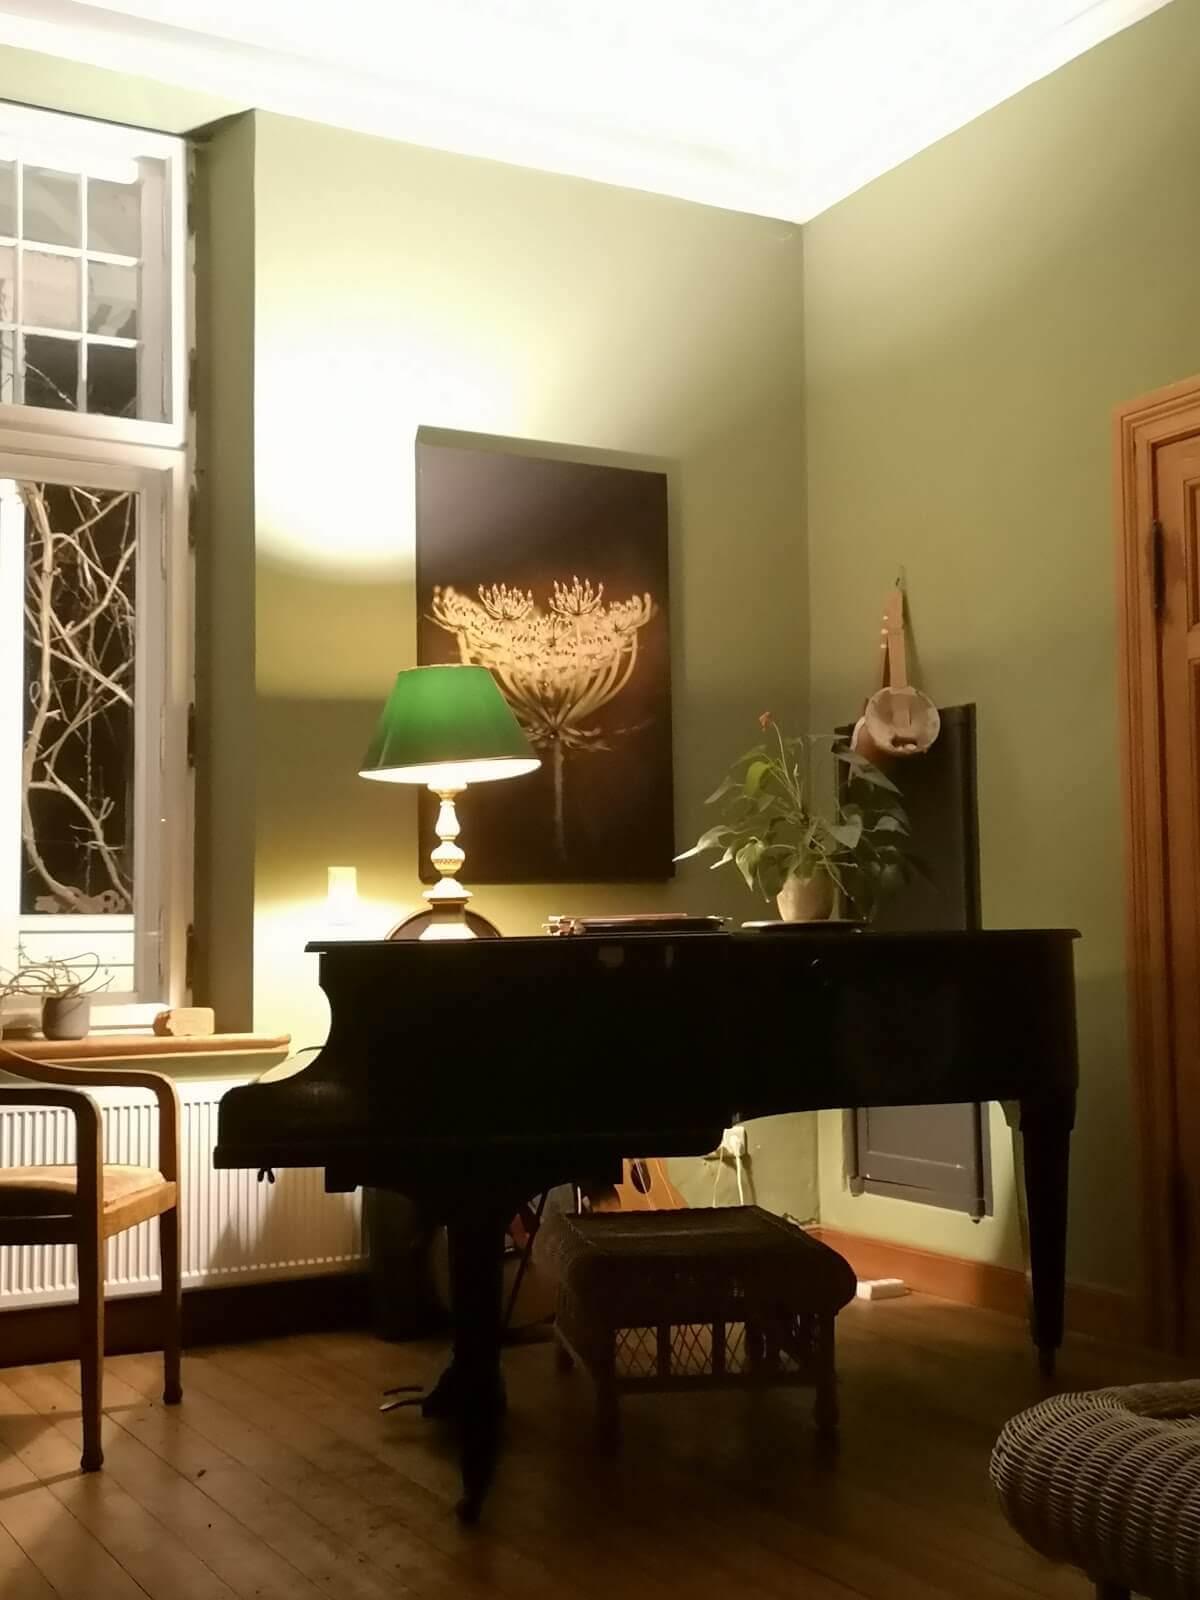 Gutshaus Ehmkendorf - Klavier im grünen Salon